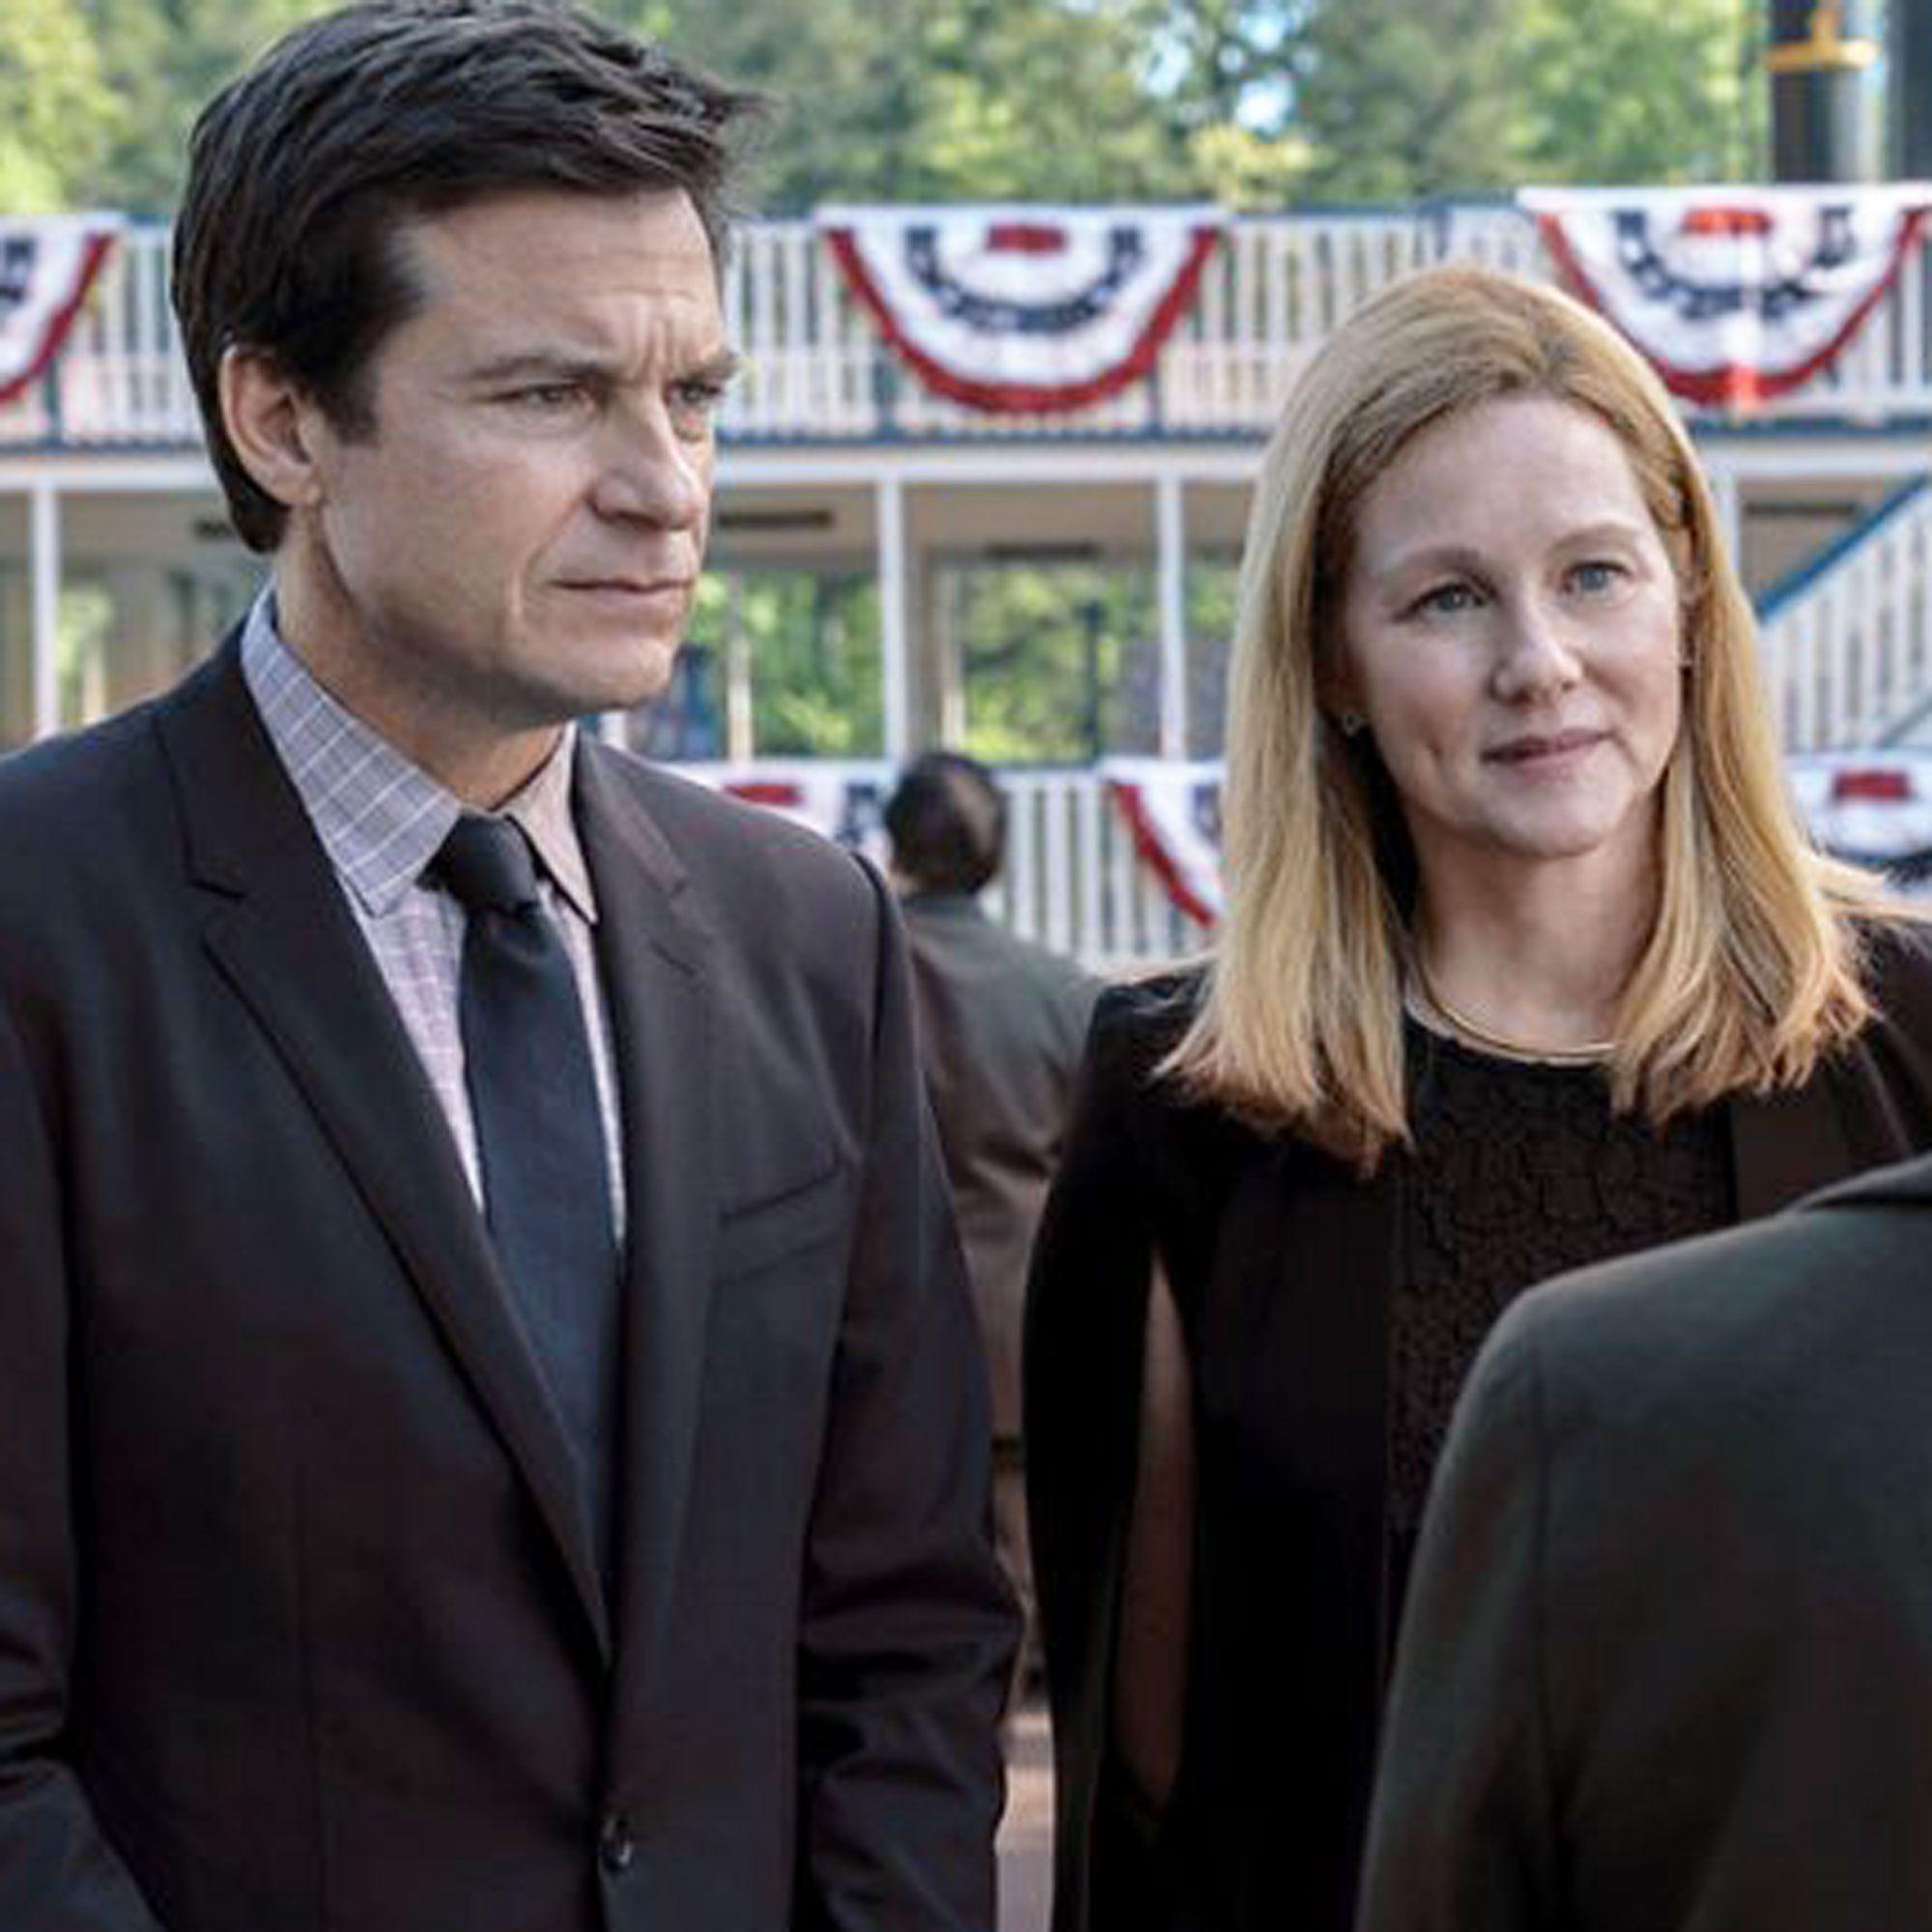 Ozark season 3 plot, release date, cast, trailer and